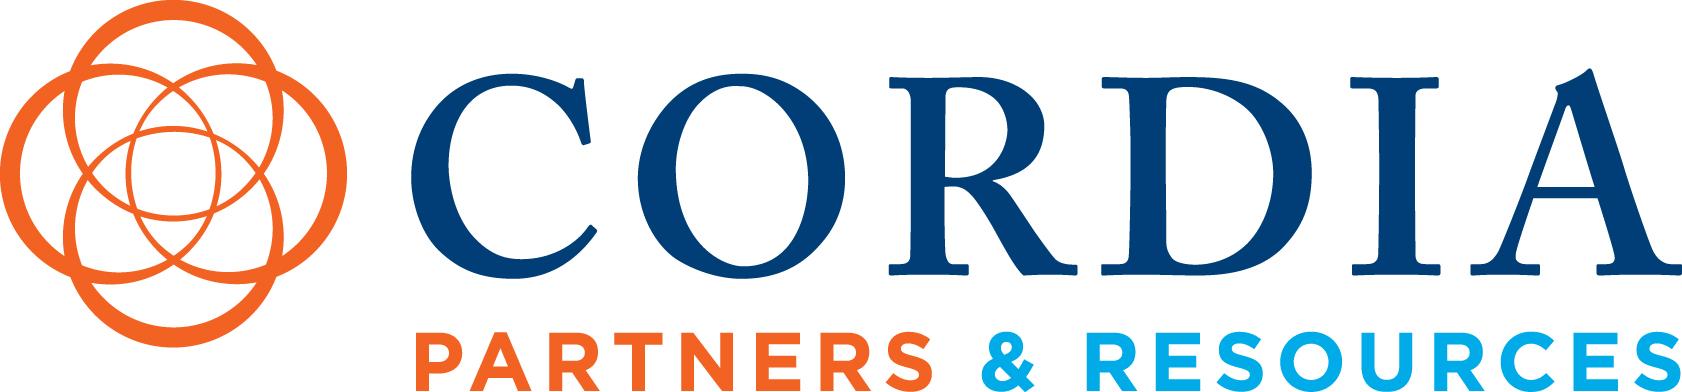 Cordia Partners-Resources.jpg